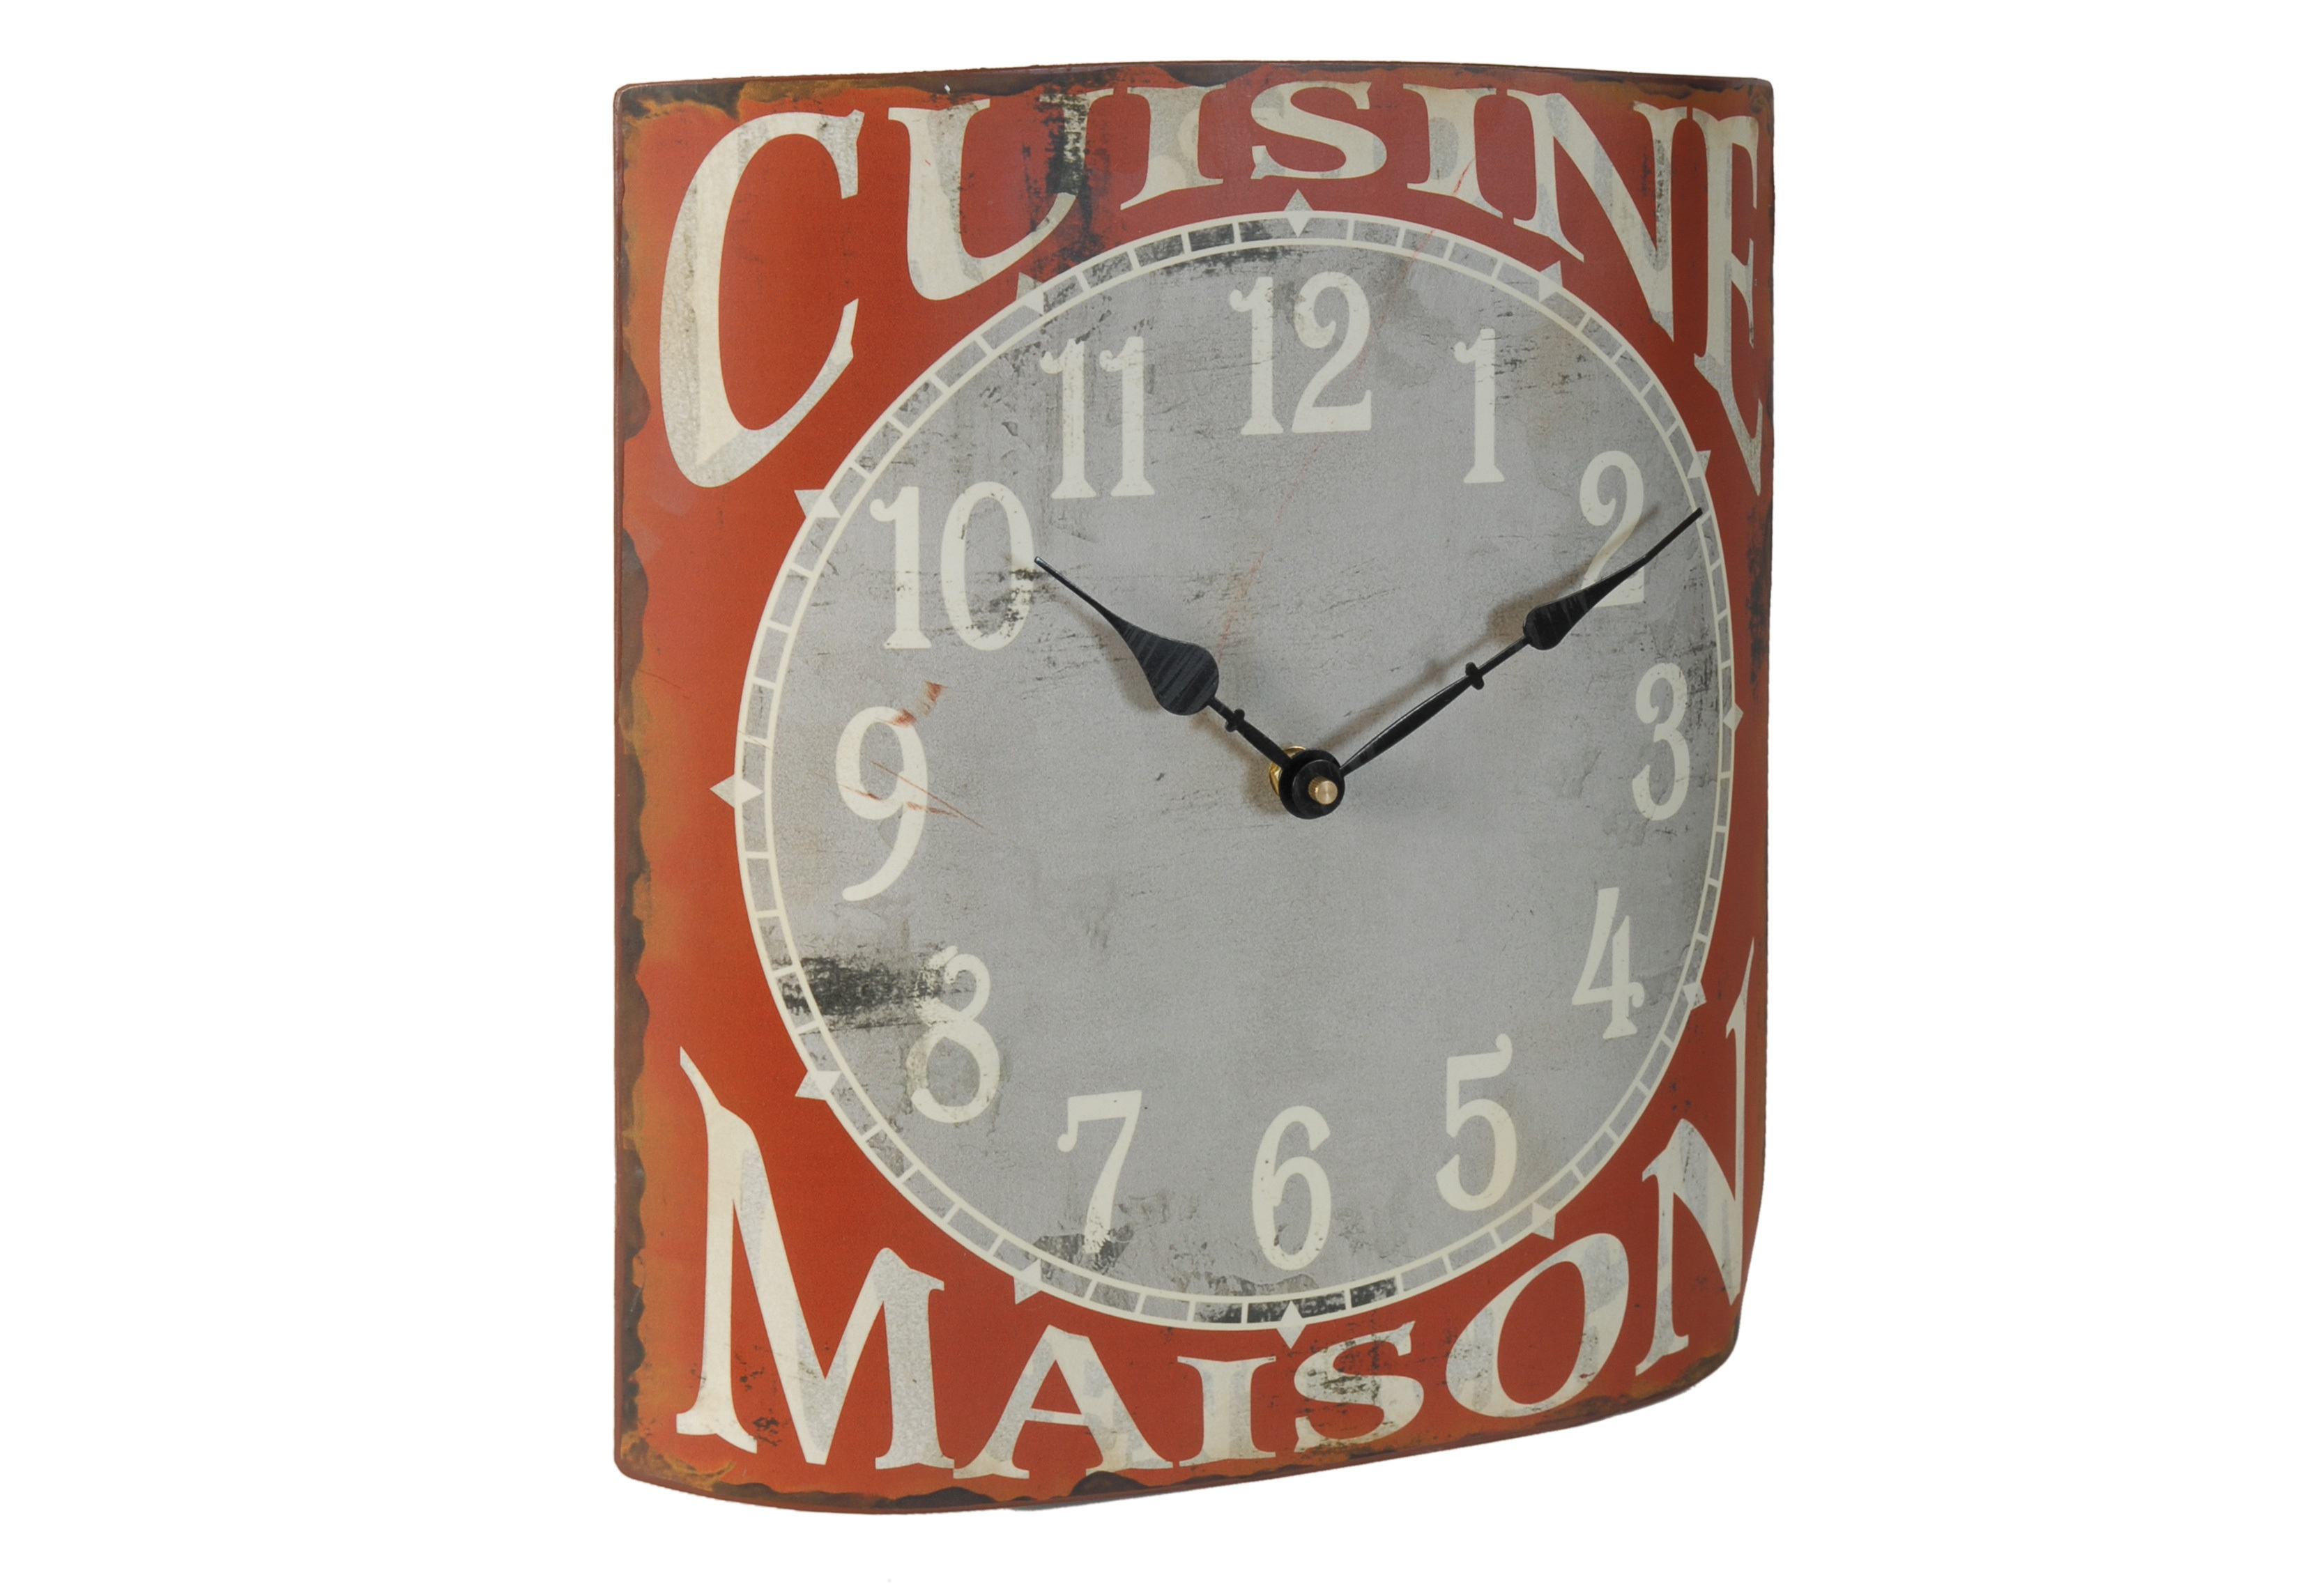 Настенные часы Cuisine MaisonНастенные часы<br>Батарейки типа AА.<br><br>Material: Железо<br>Length см: None<br>Width см: 32<br>Depth см: 6,6<br>Height см: 35